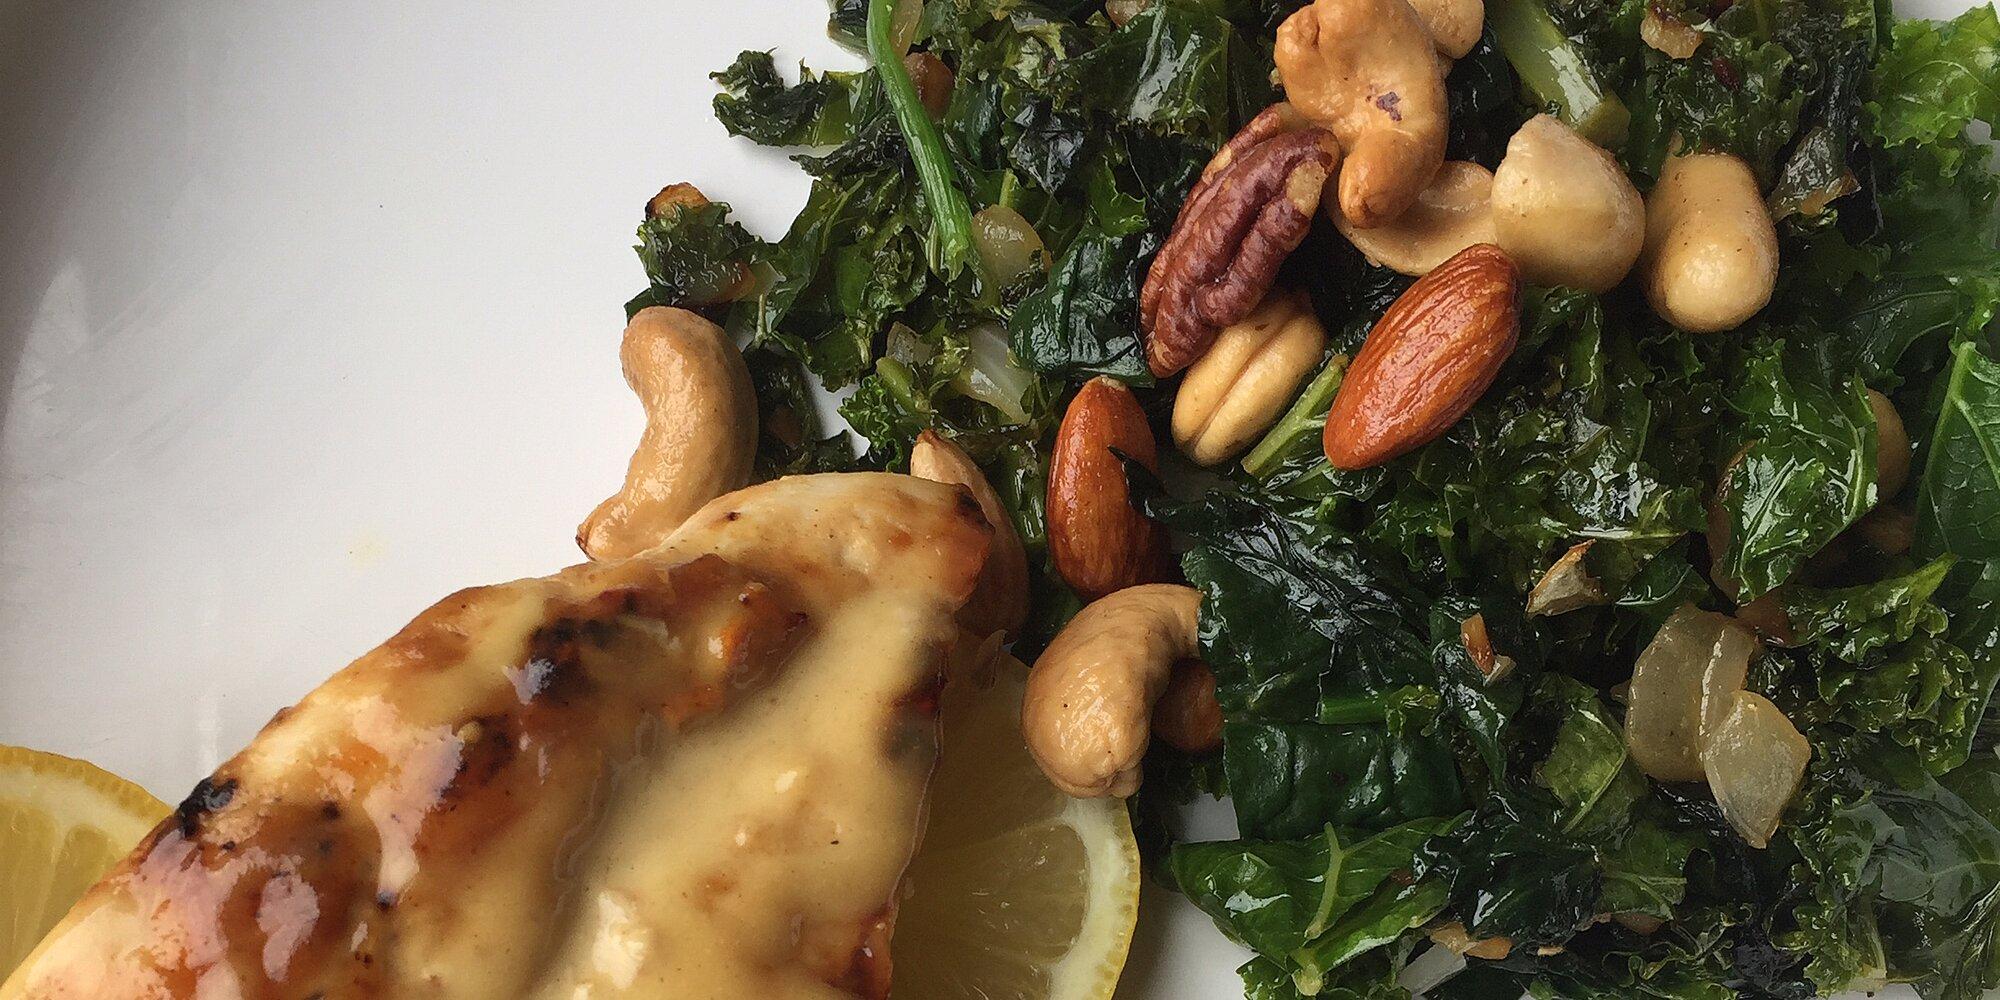 dawns kale side dish recipe